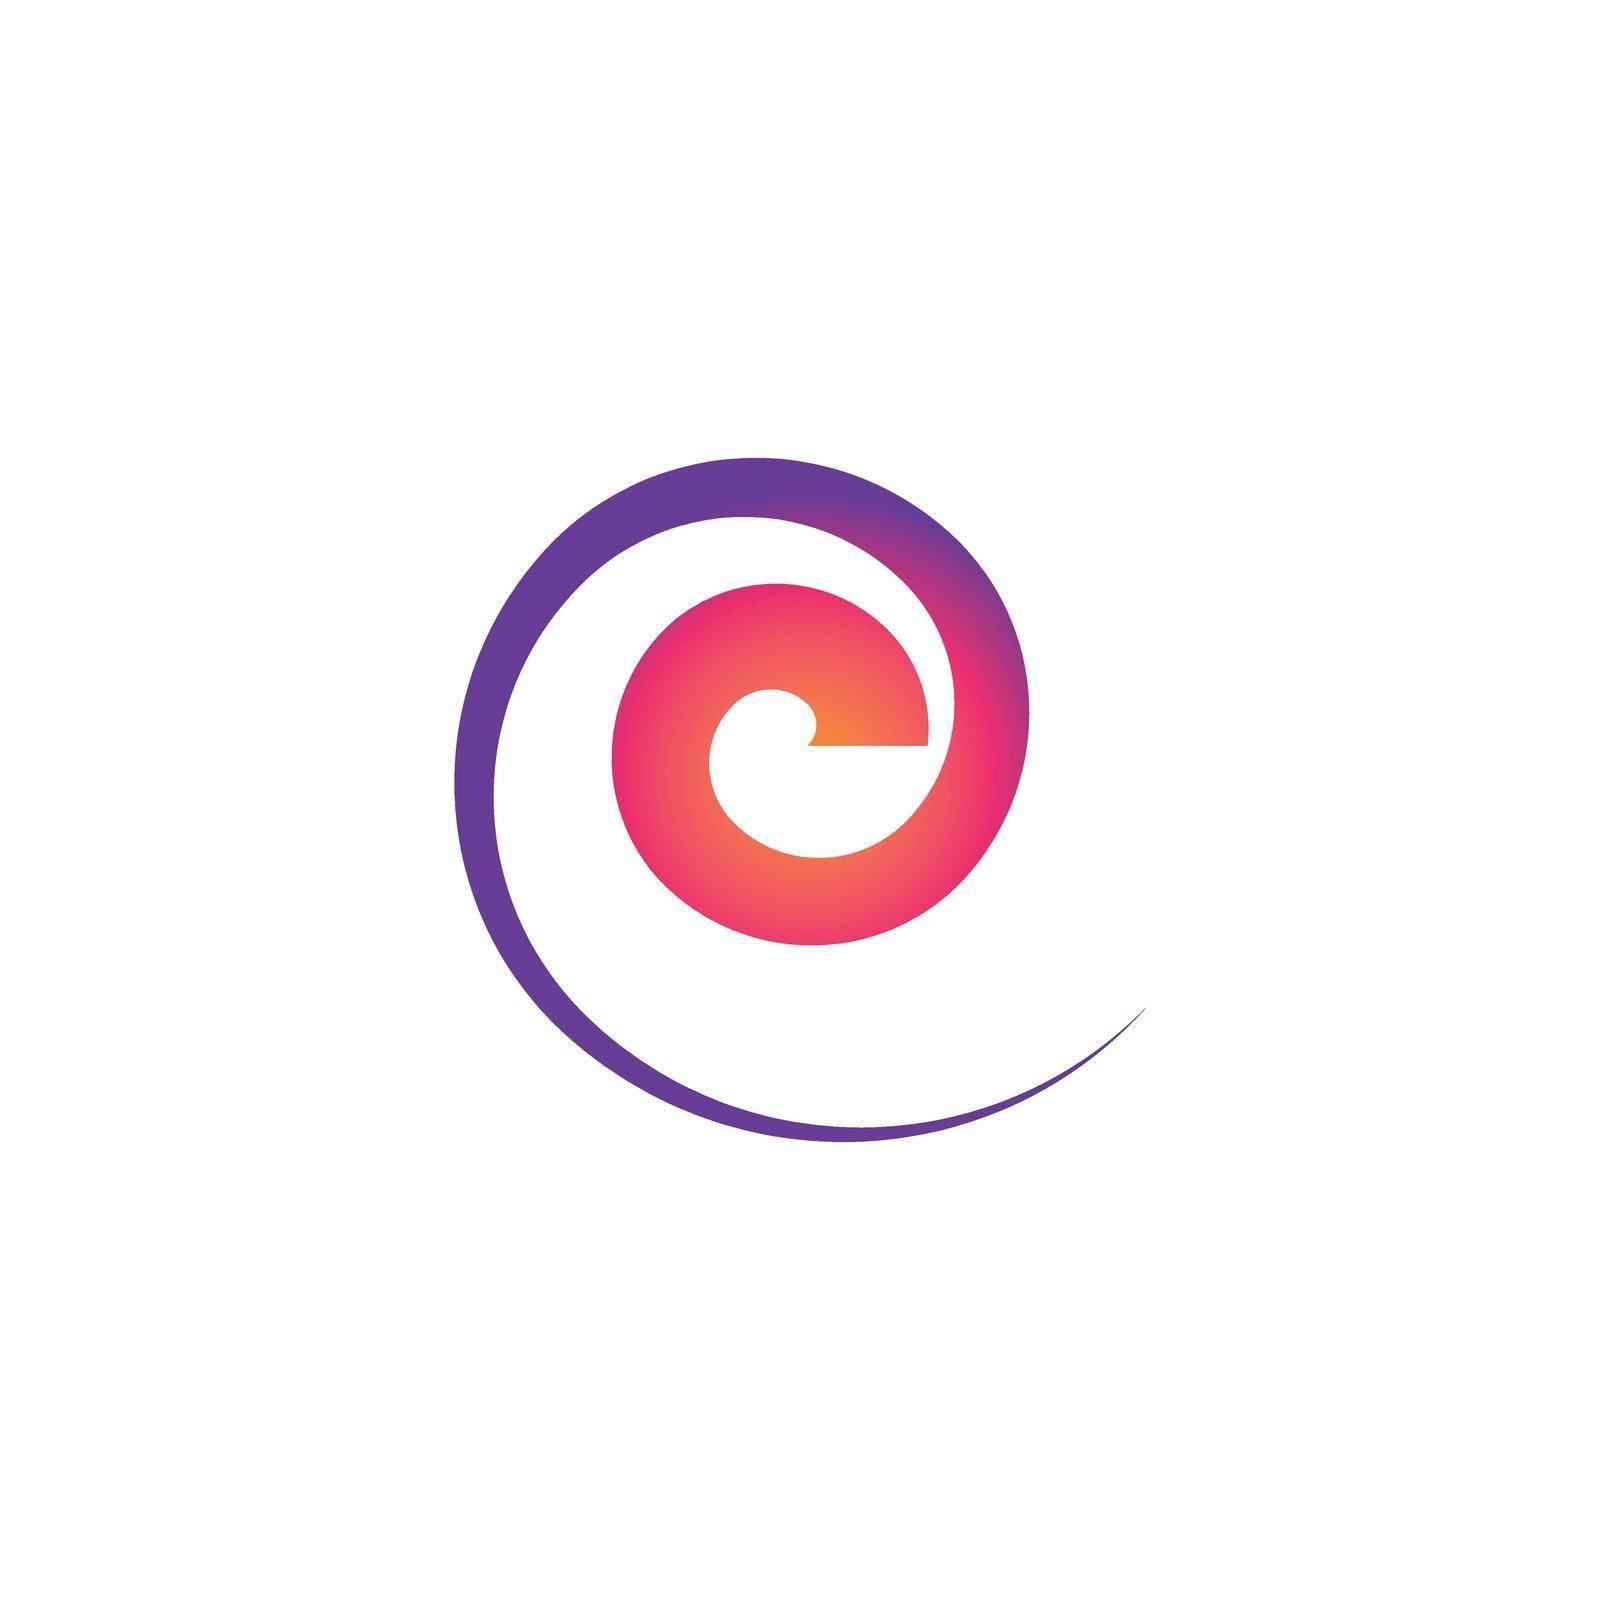 Abstract circle vector flat design